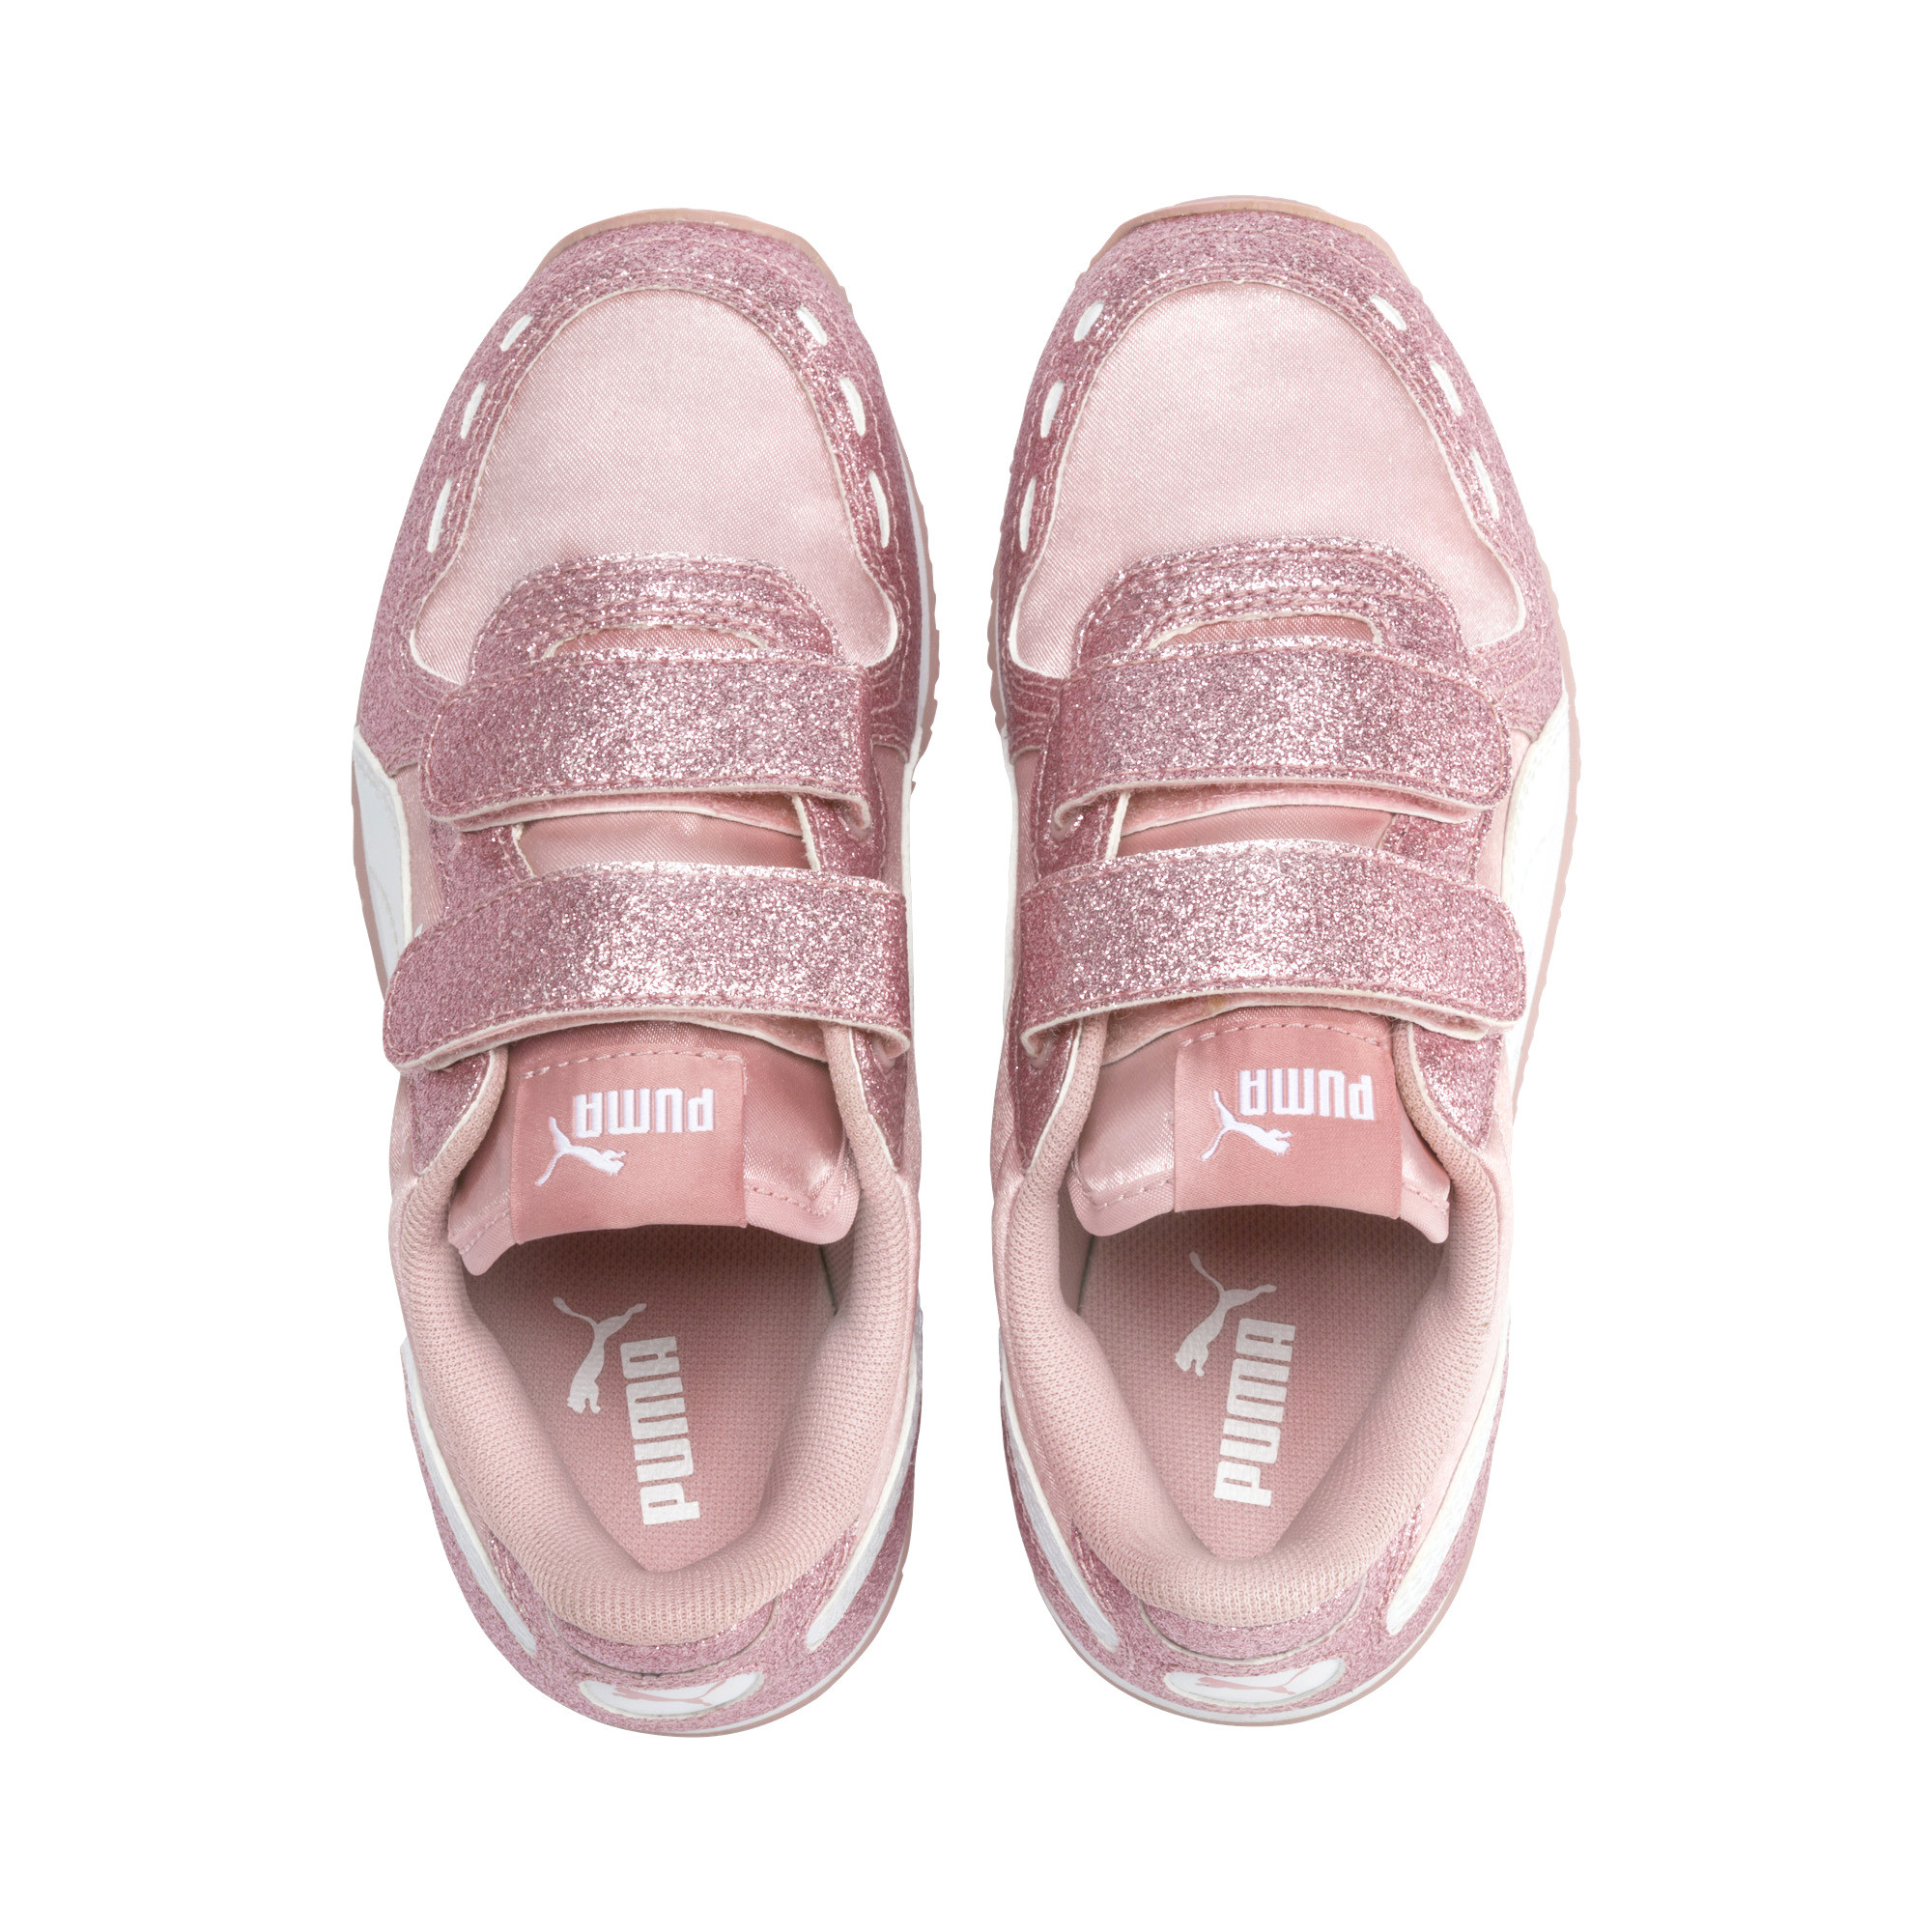 PUMA-Pre-School-Girl-039-s-Cabana-Racer-Glitz-AC-Shoes thumbnail 7